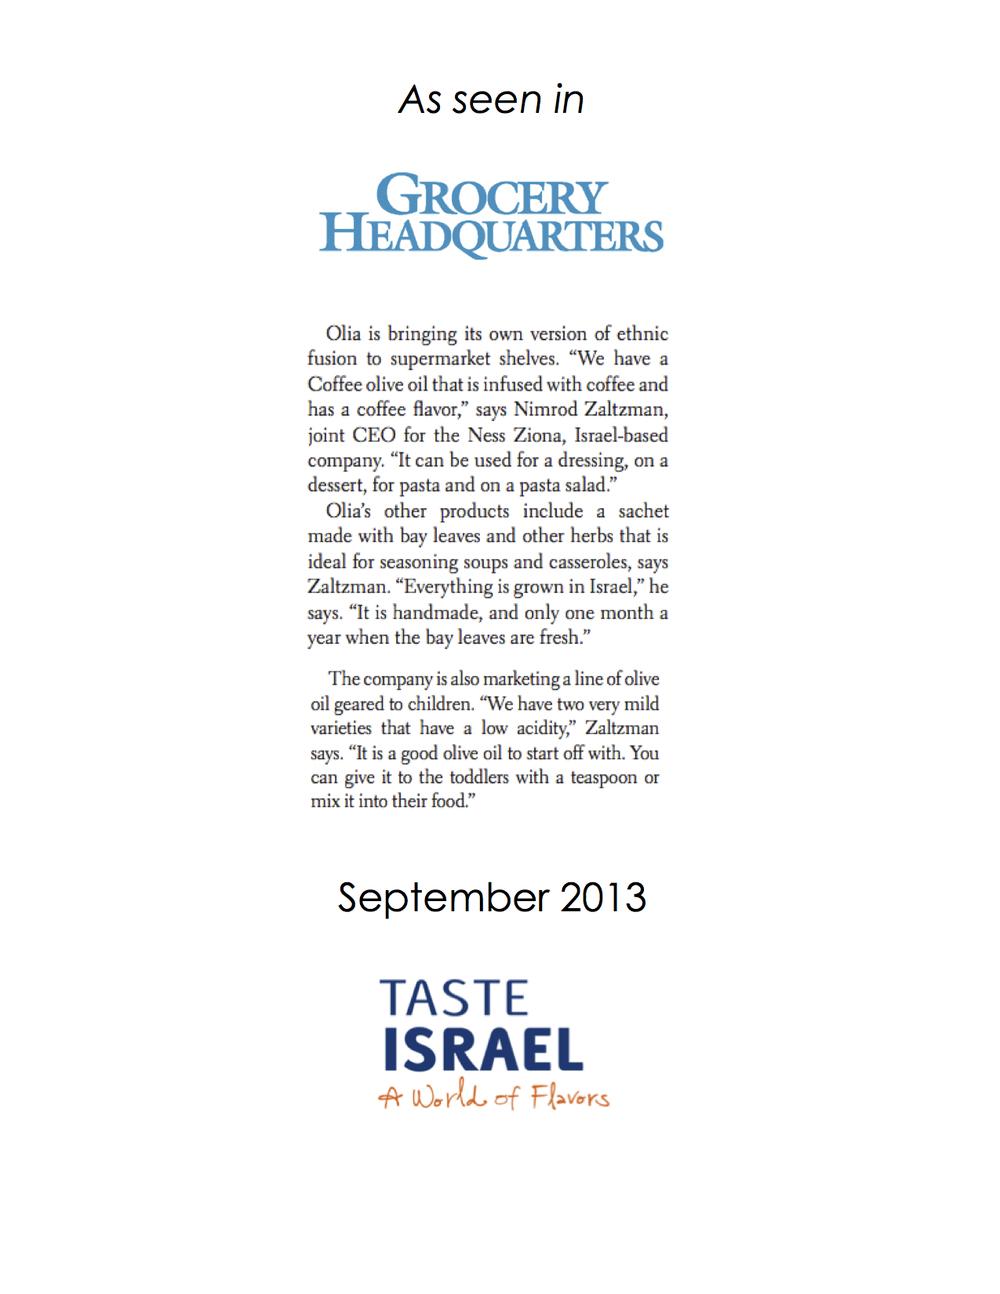 israel-asseenin-groceryheadquarters1 copy.jpg